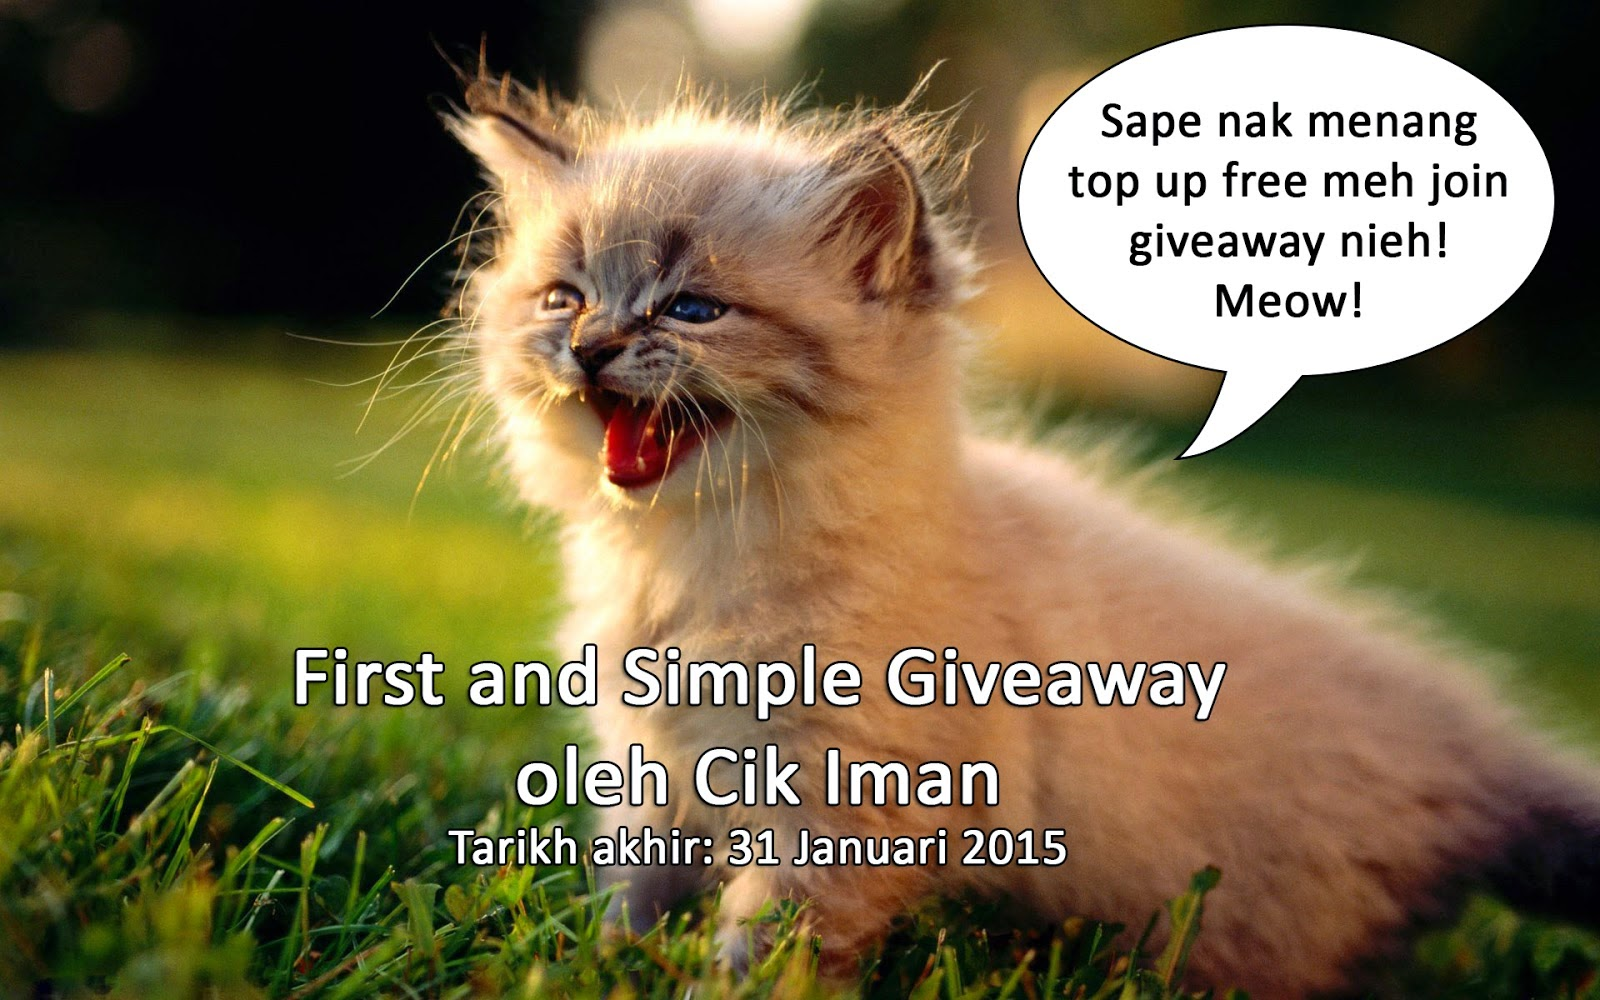 First and Simple Giveaway oleh Cik Iman